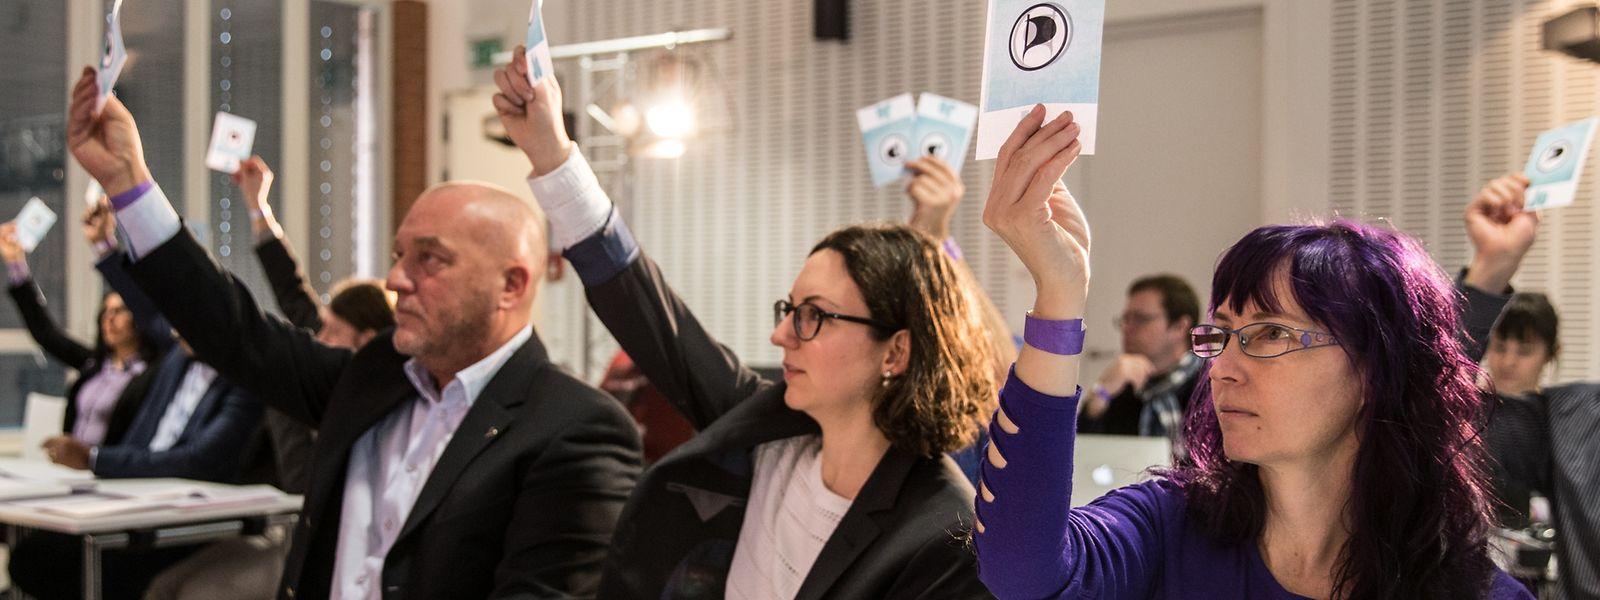 IPO, Landeskongress Piraten.Foto: Gerry Huberty/Luxemburger Wort